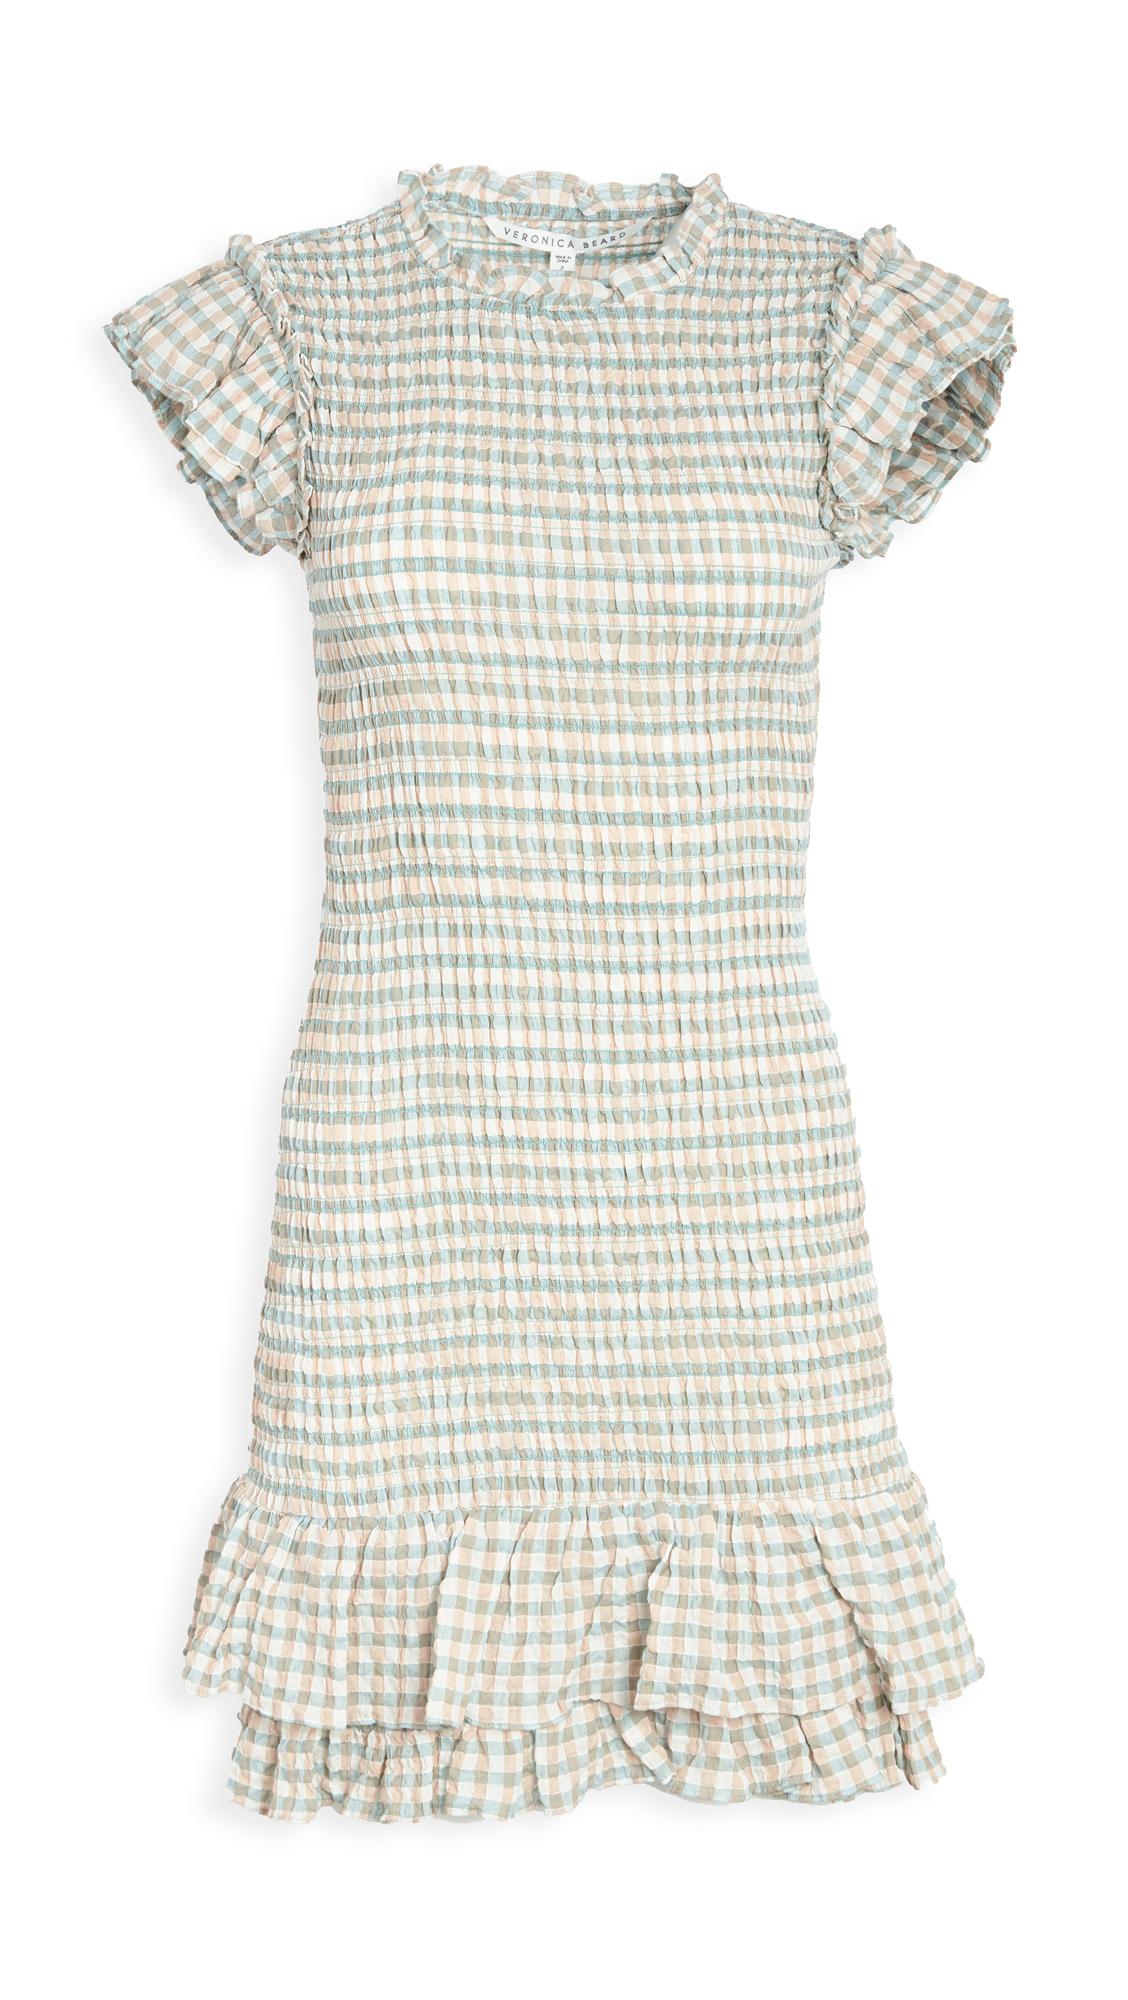 Photo of Veronica Beard Cici Dress - shop Veronica Beard Clothing, Dresses online